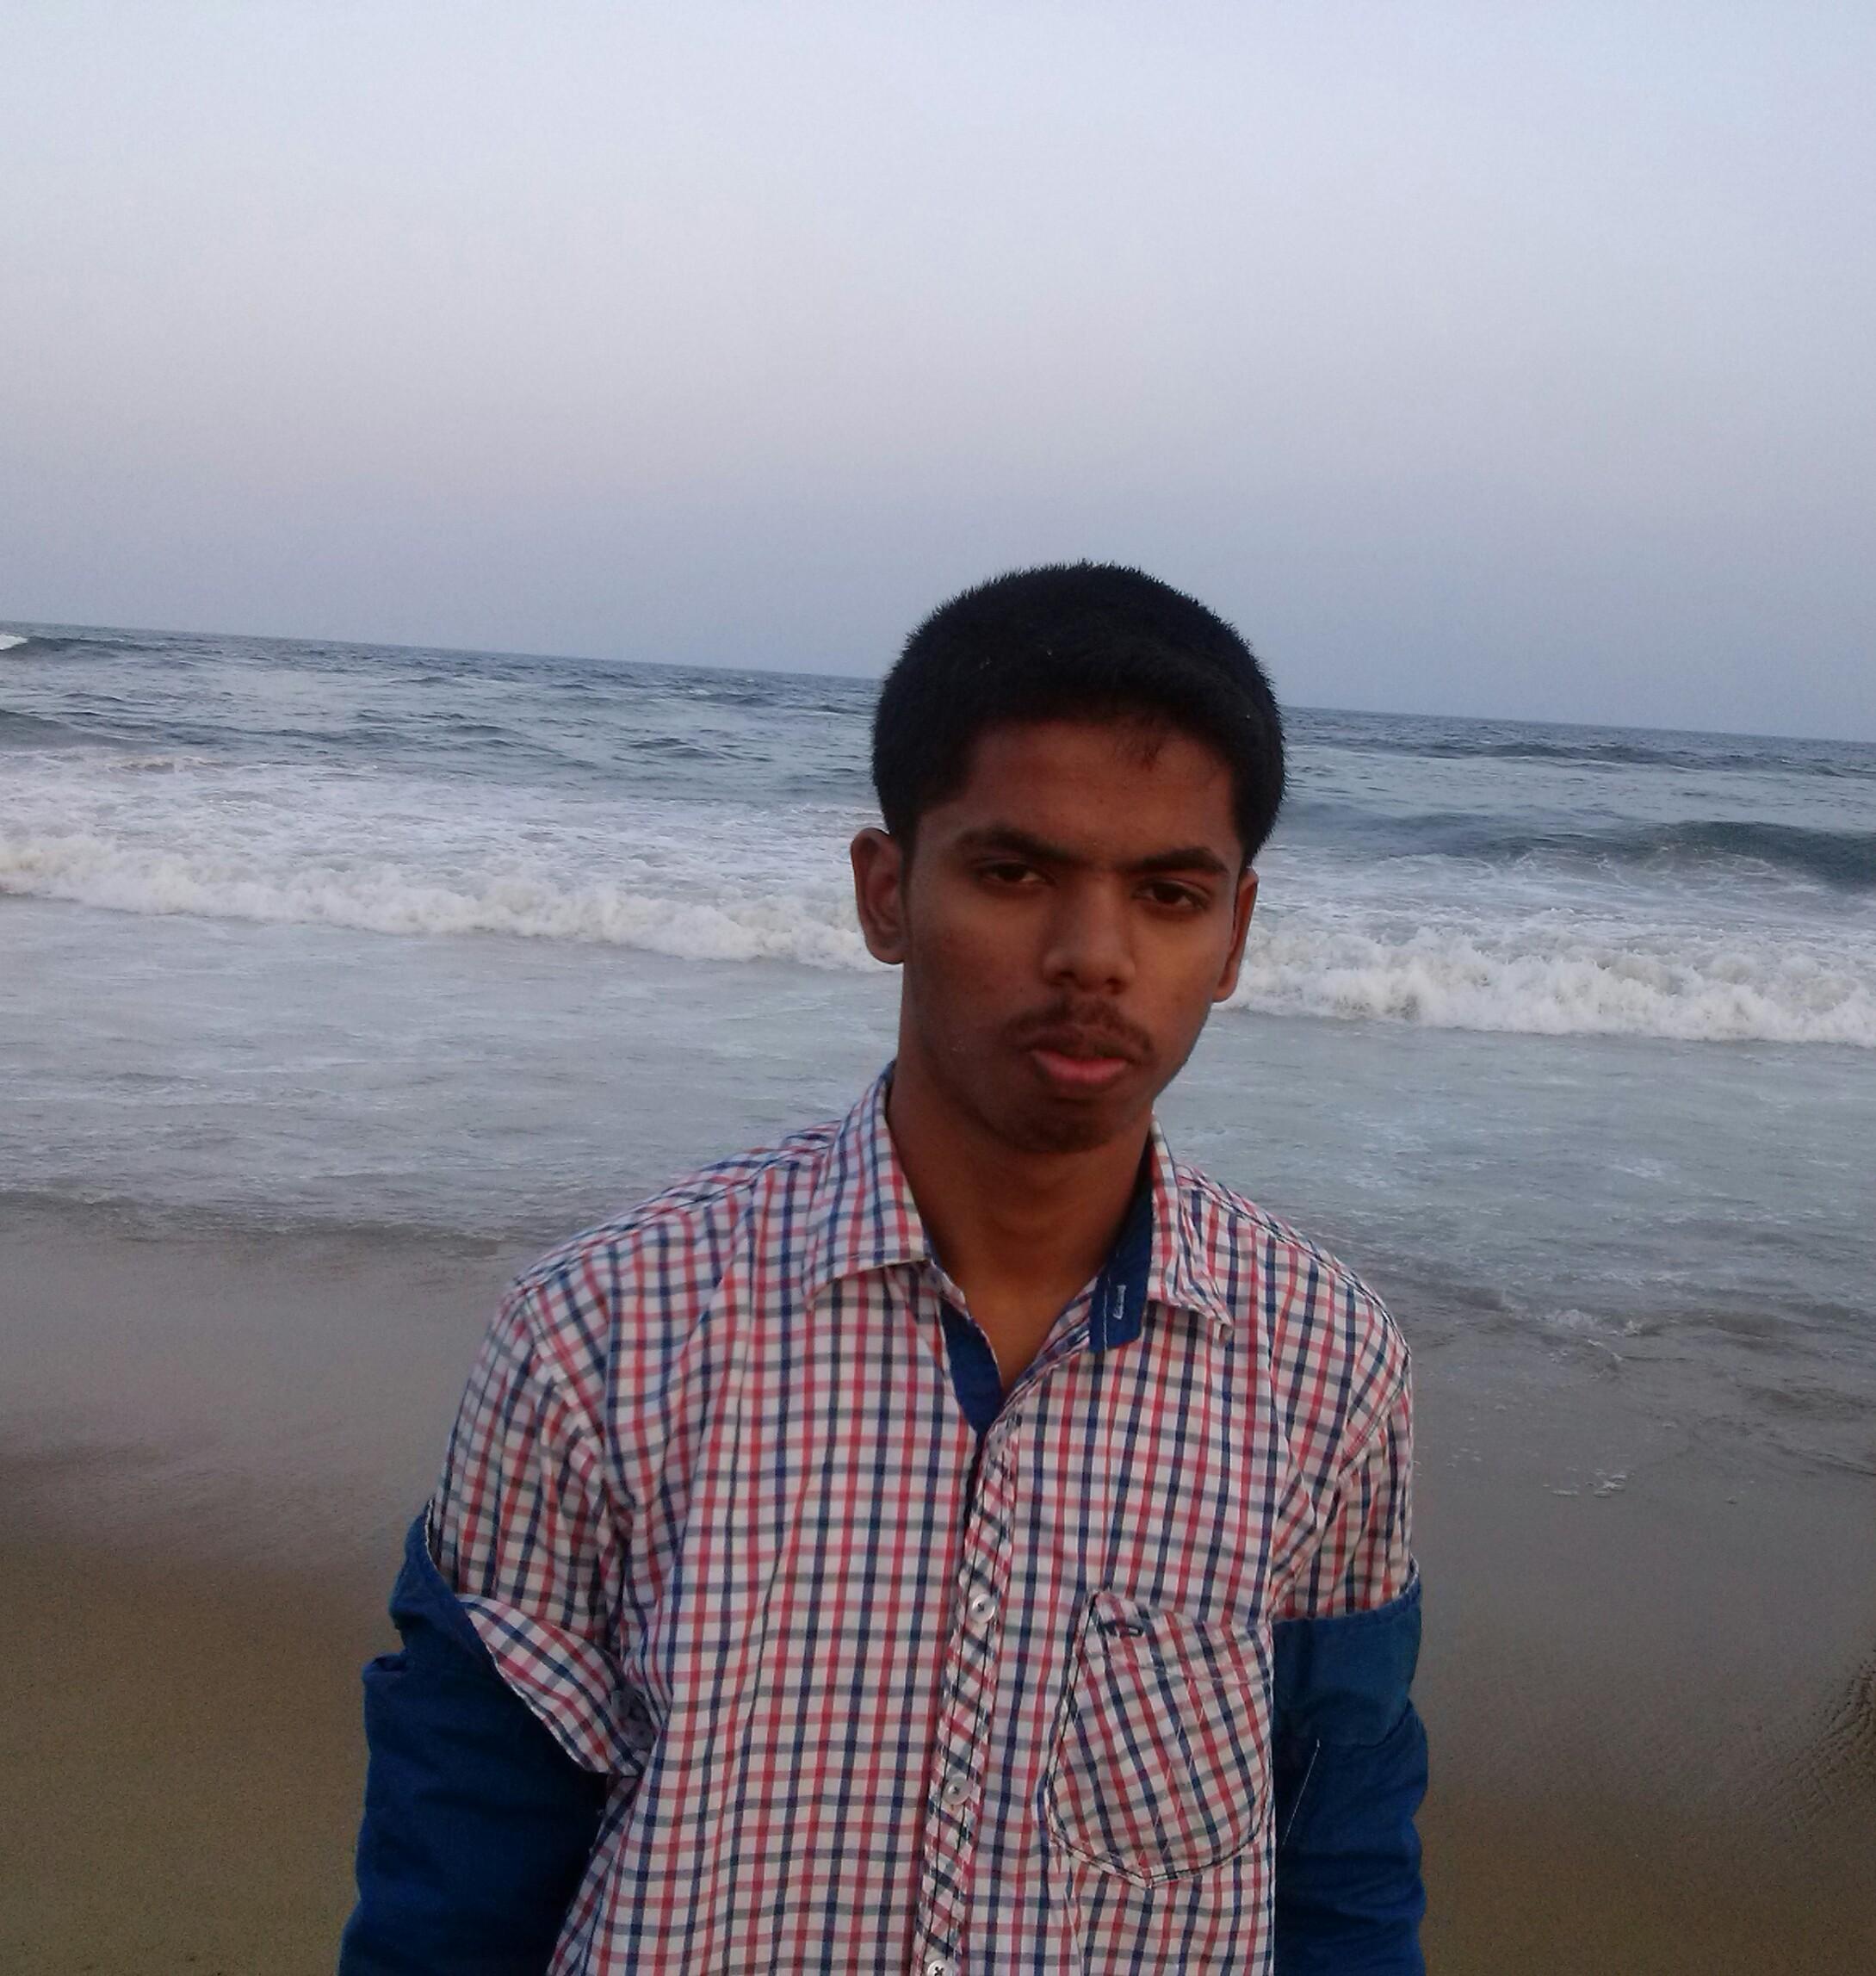 ChitraiSelvam